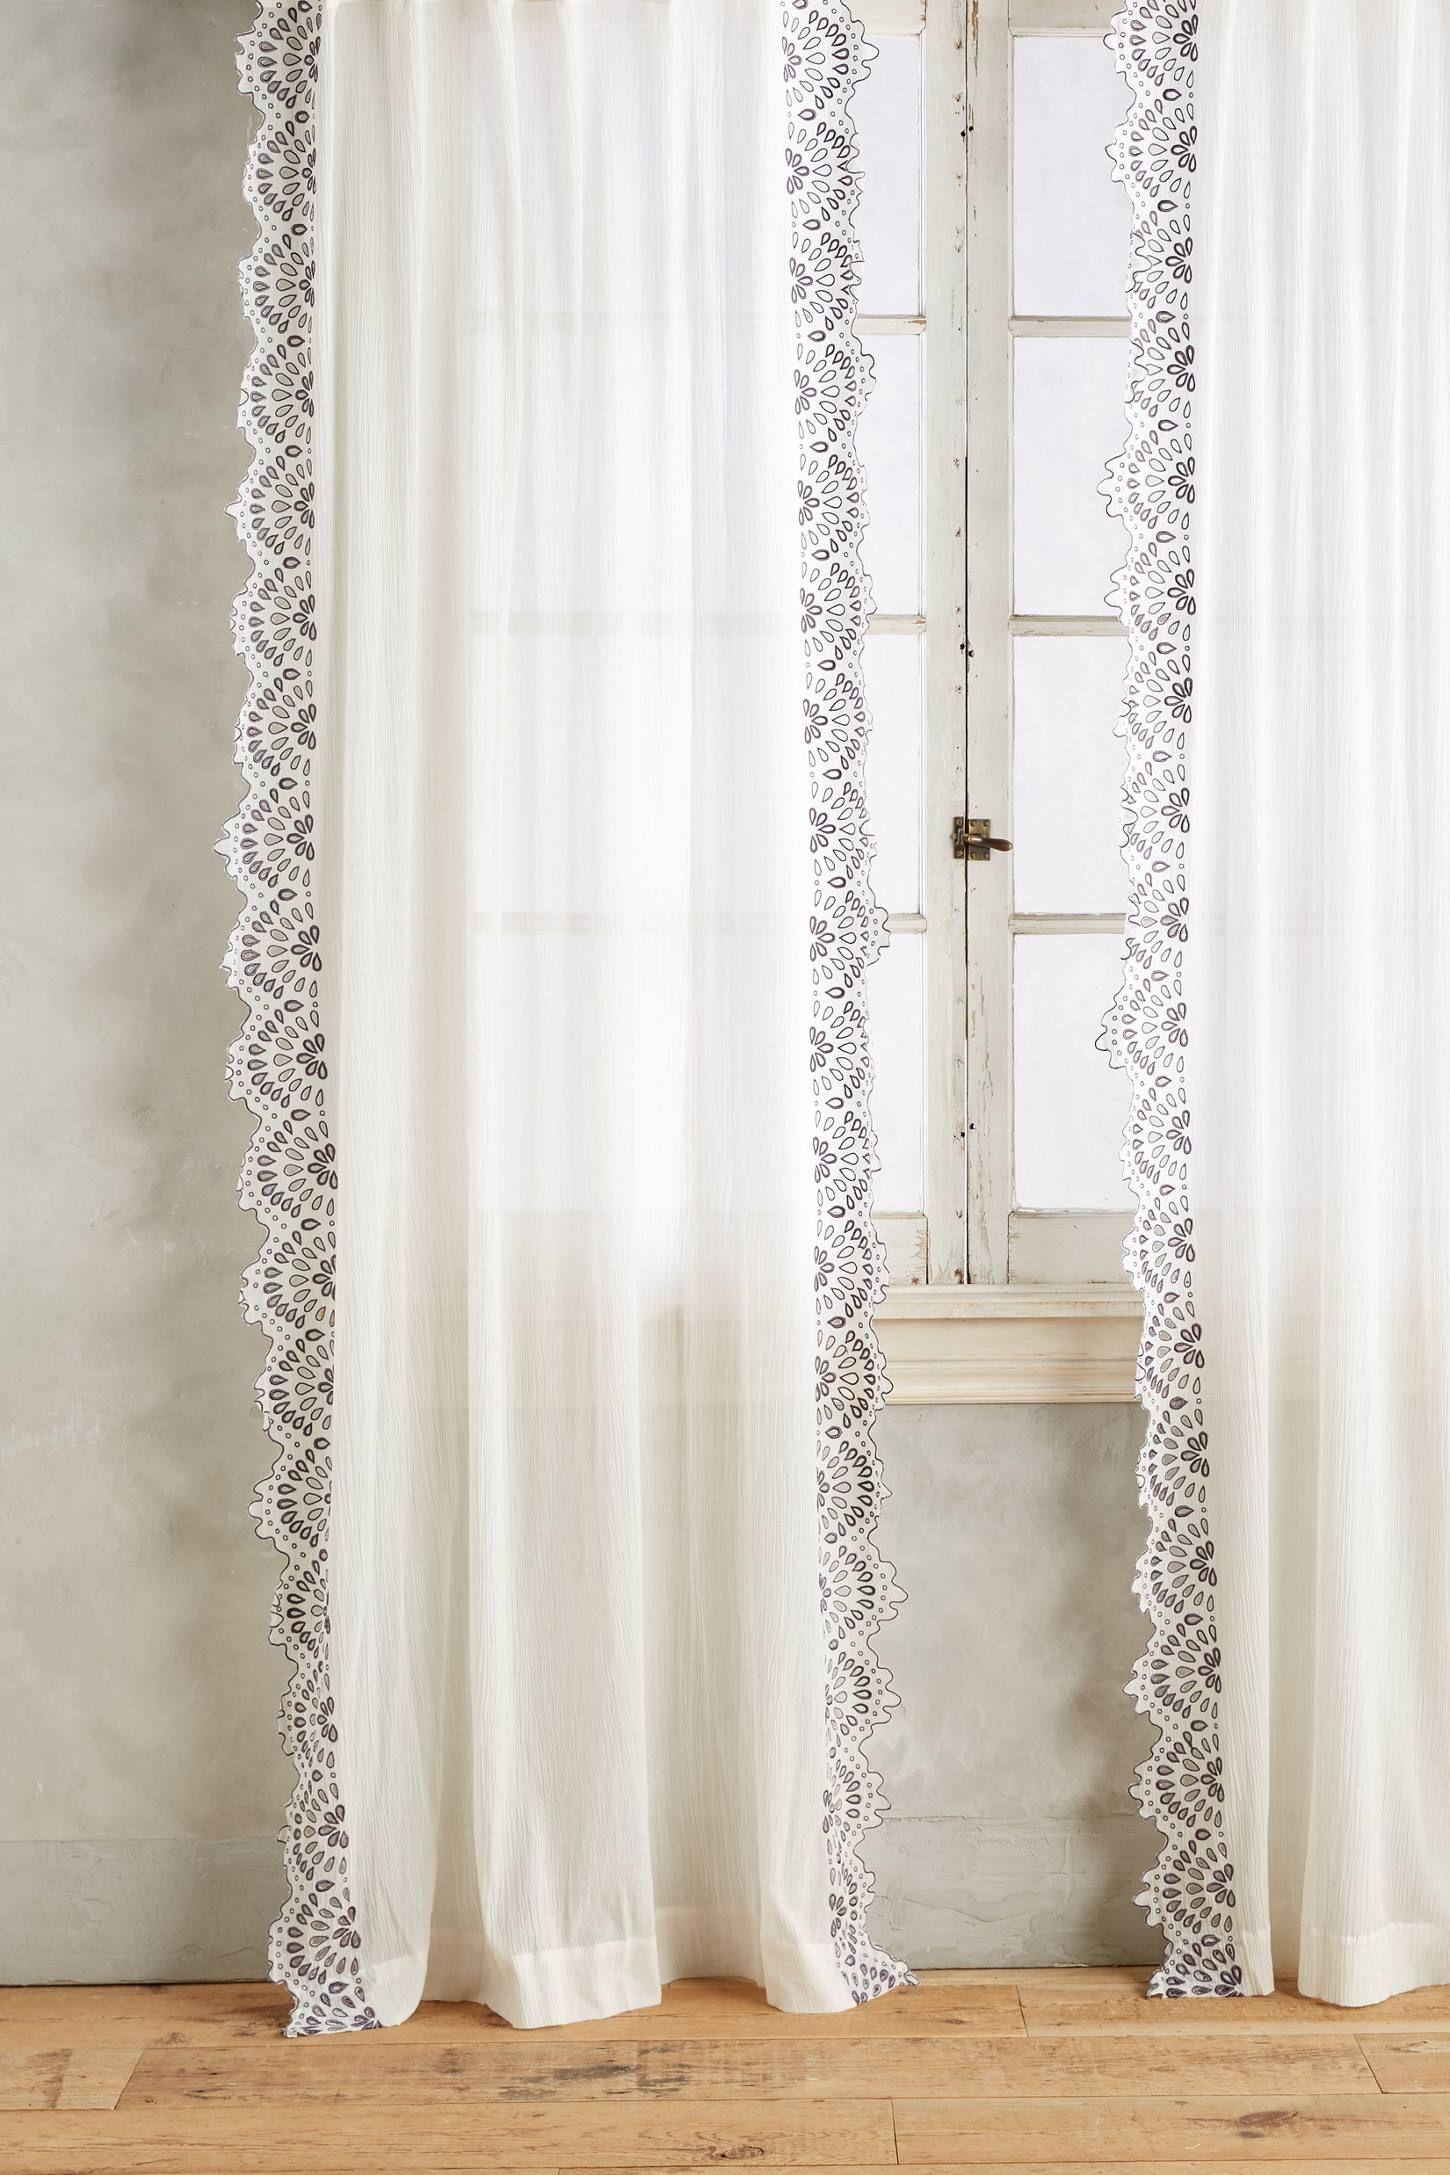 Smithery Curtain Rod | Farmhouse style bedrooms, Curtain ... on Farmhouse Bedroom Curtain Ideas  id=37878